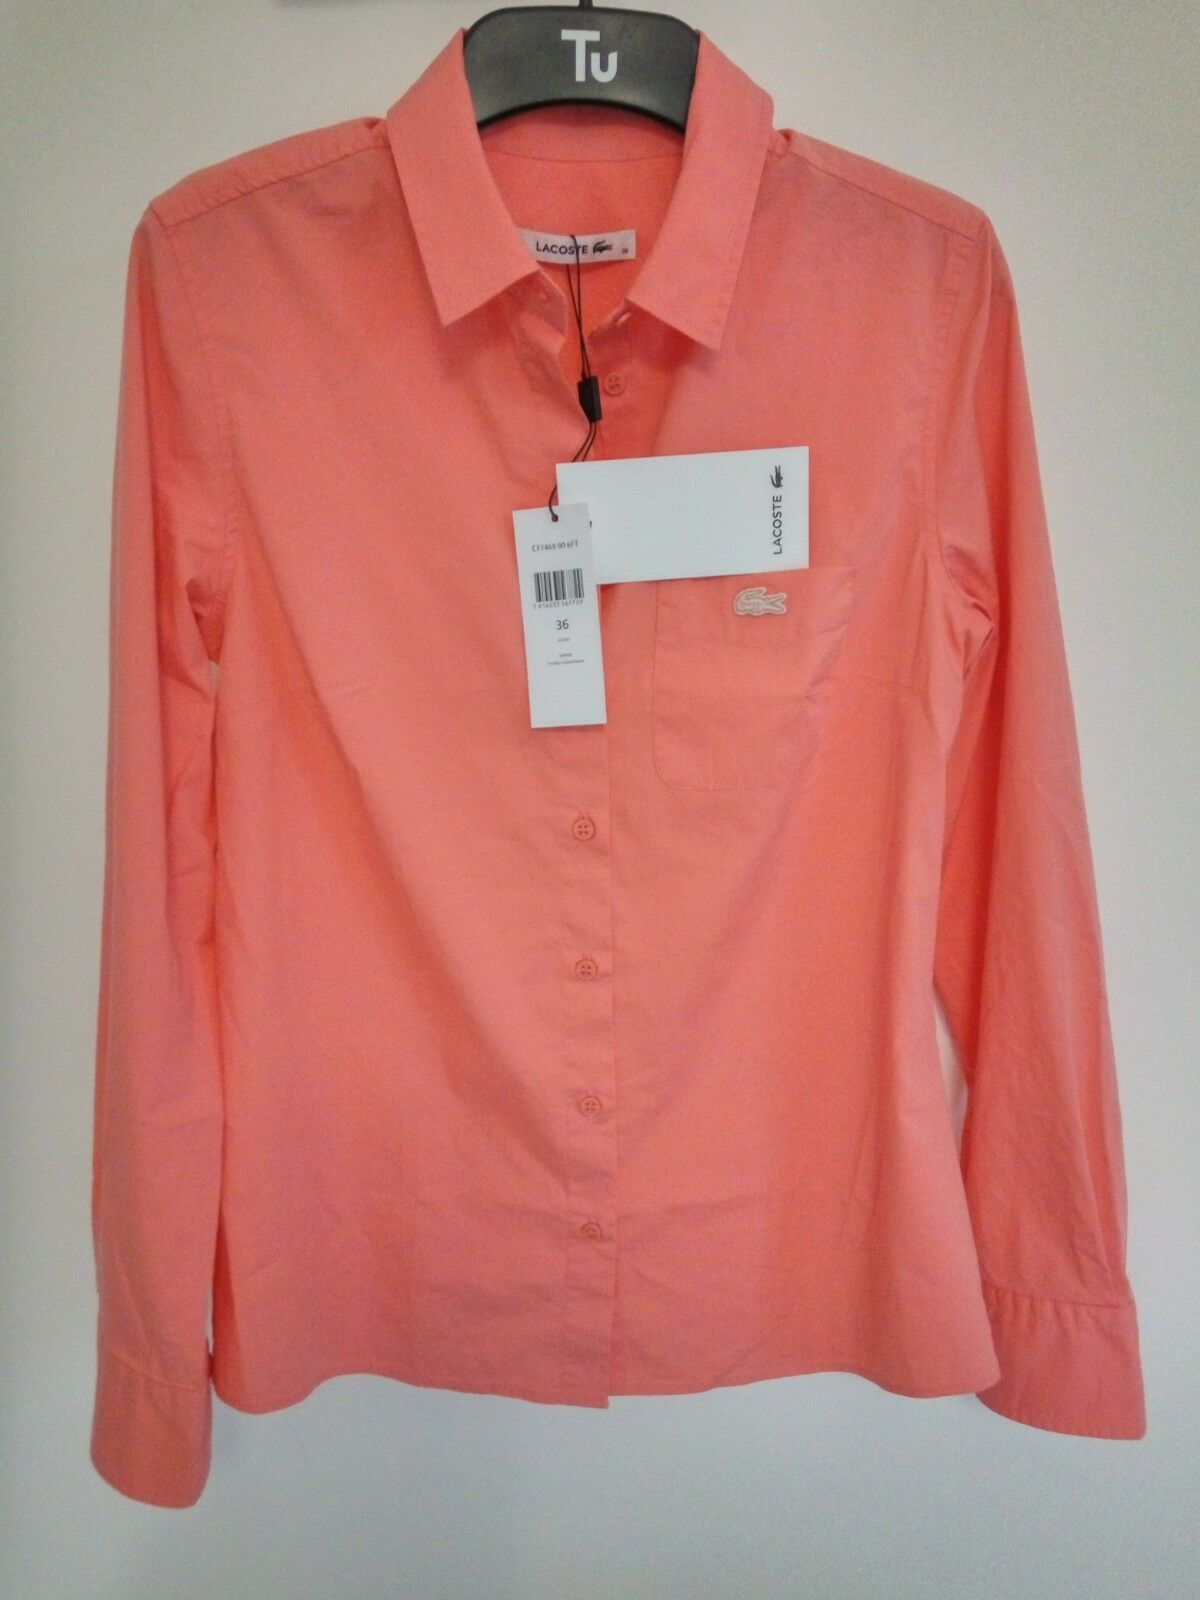 Woherren LACOSTE Stretch Top Shirt Salmon Farbe Größe S   BNWT - RRP